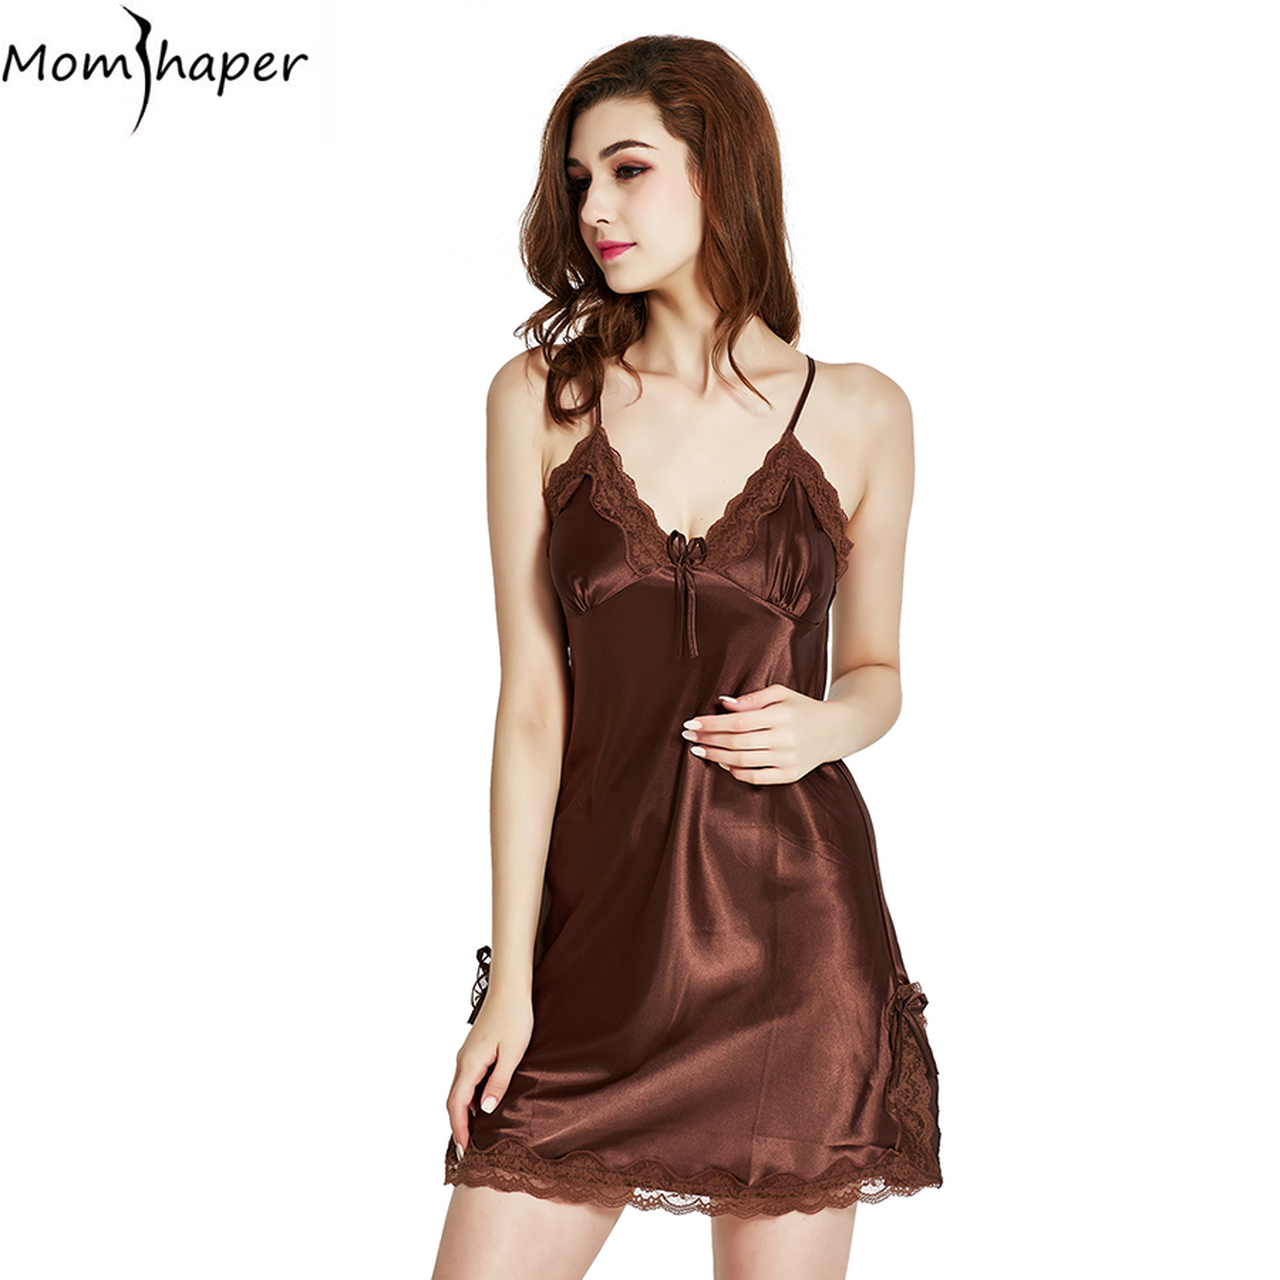 e6e2635158146 ... Sleepwear pyjamas women Home Clothing Nightgowns Lace robe V-neck Nightgown  Silk Satin Night Dress ...